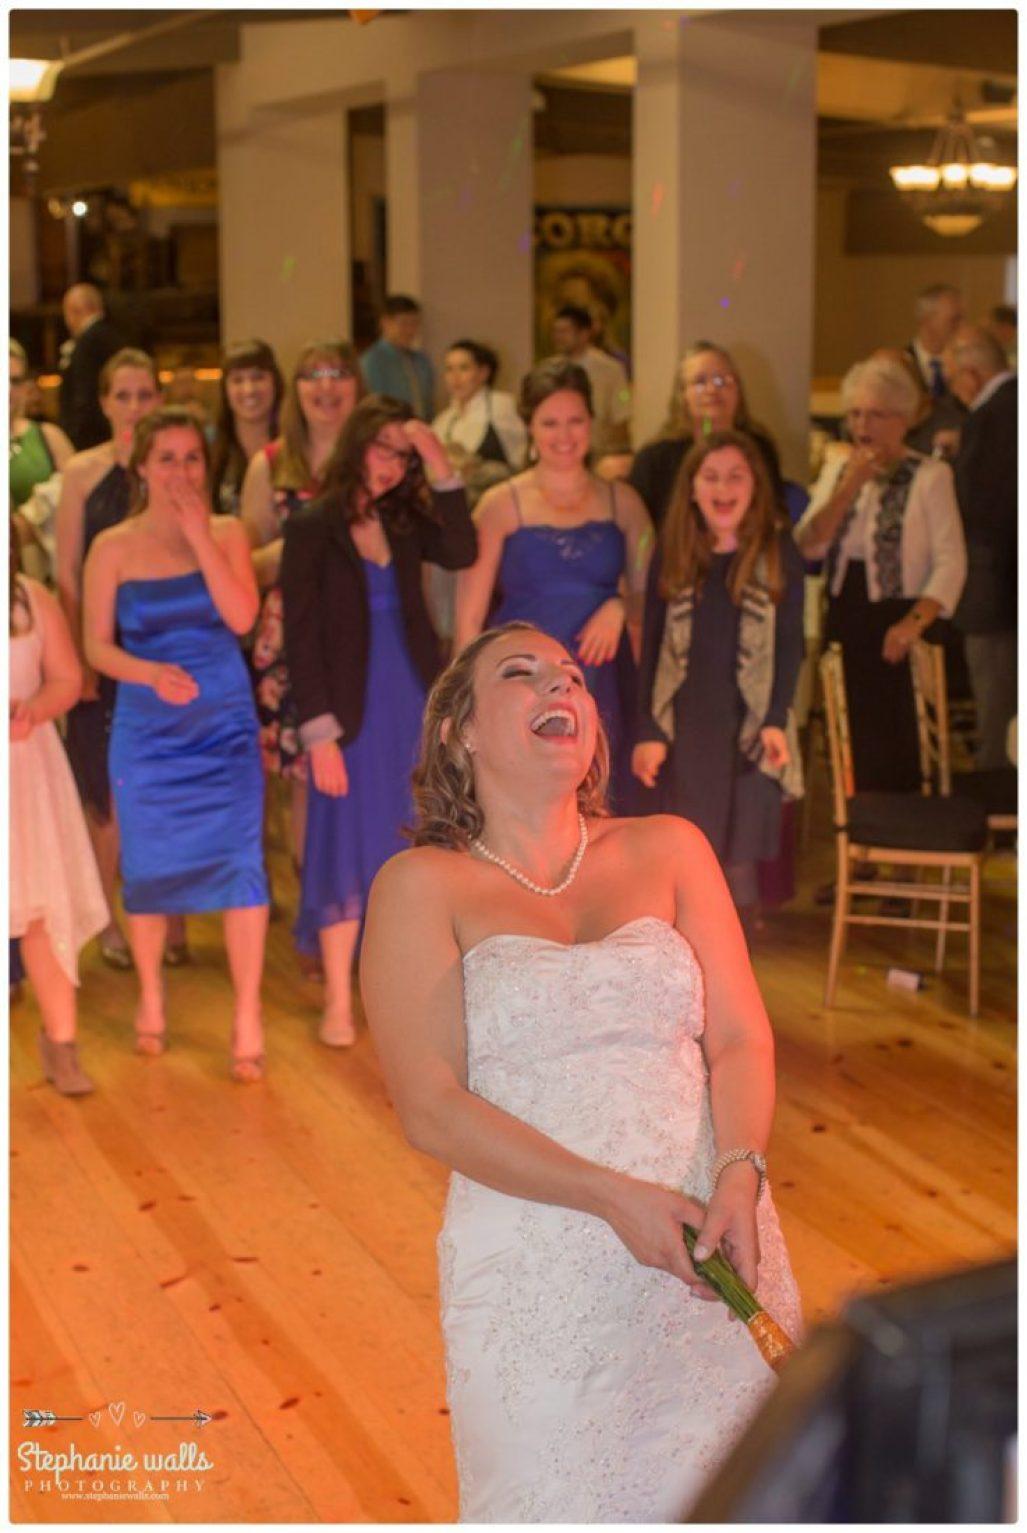 2016 03 24 0064 Racing Love   Snohomish Event Center   Snohomish Wedding Photographer